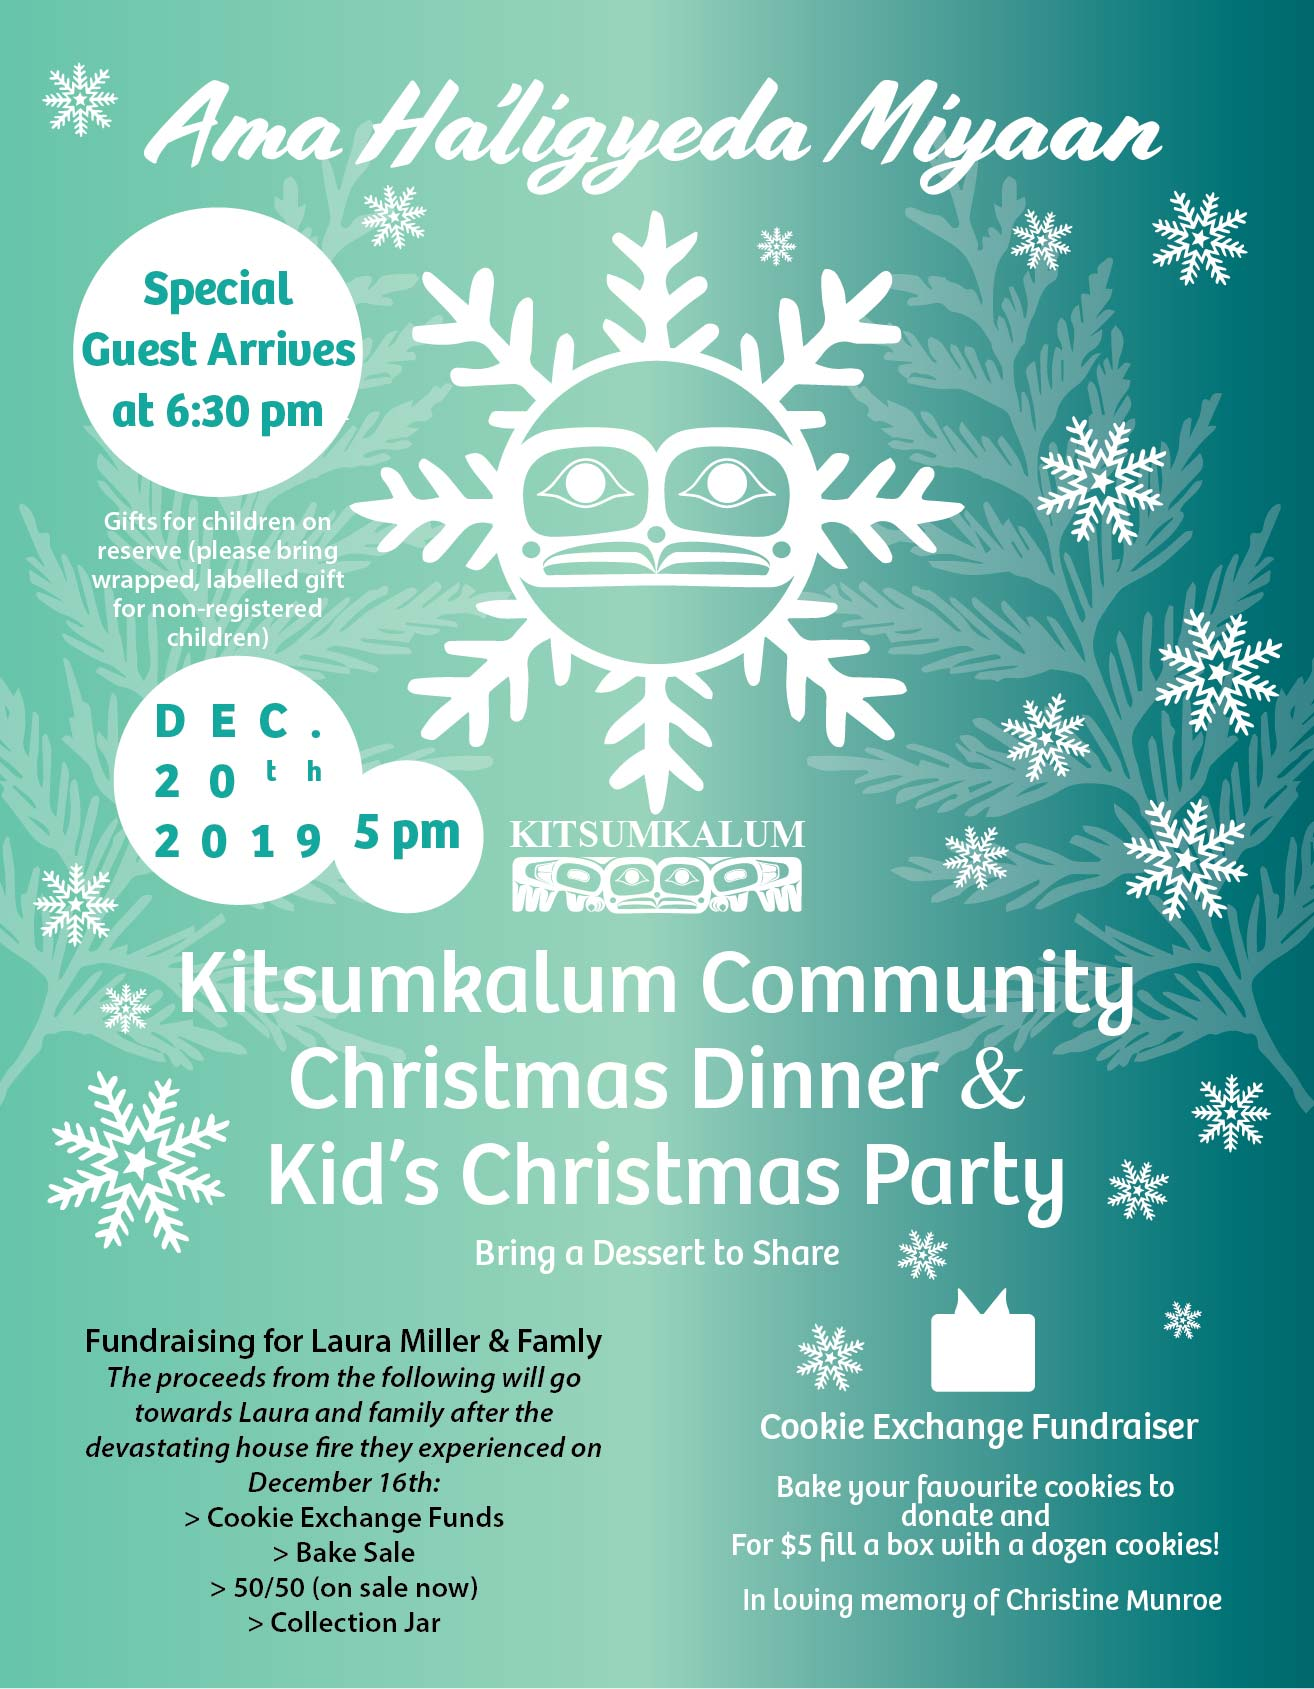 Kitsumkalum Community Christmas Dinner & Kid's Christmas Party DEC 20